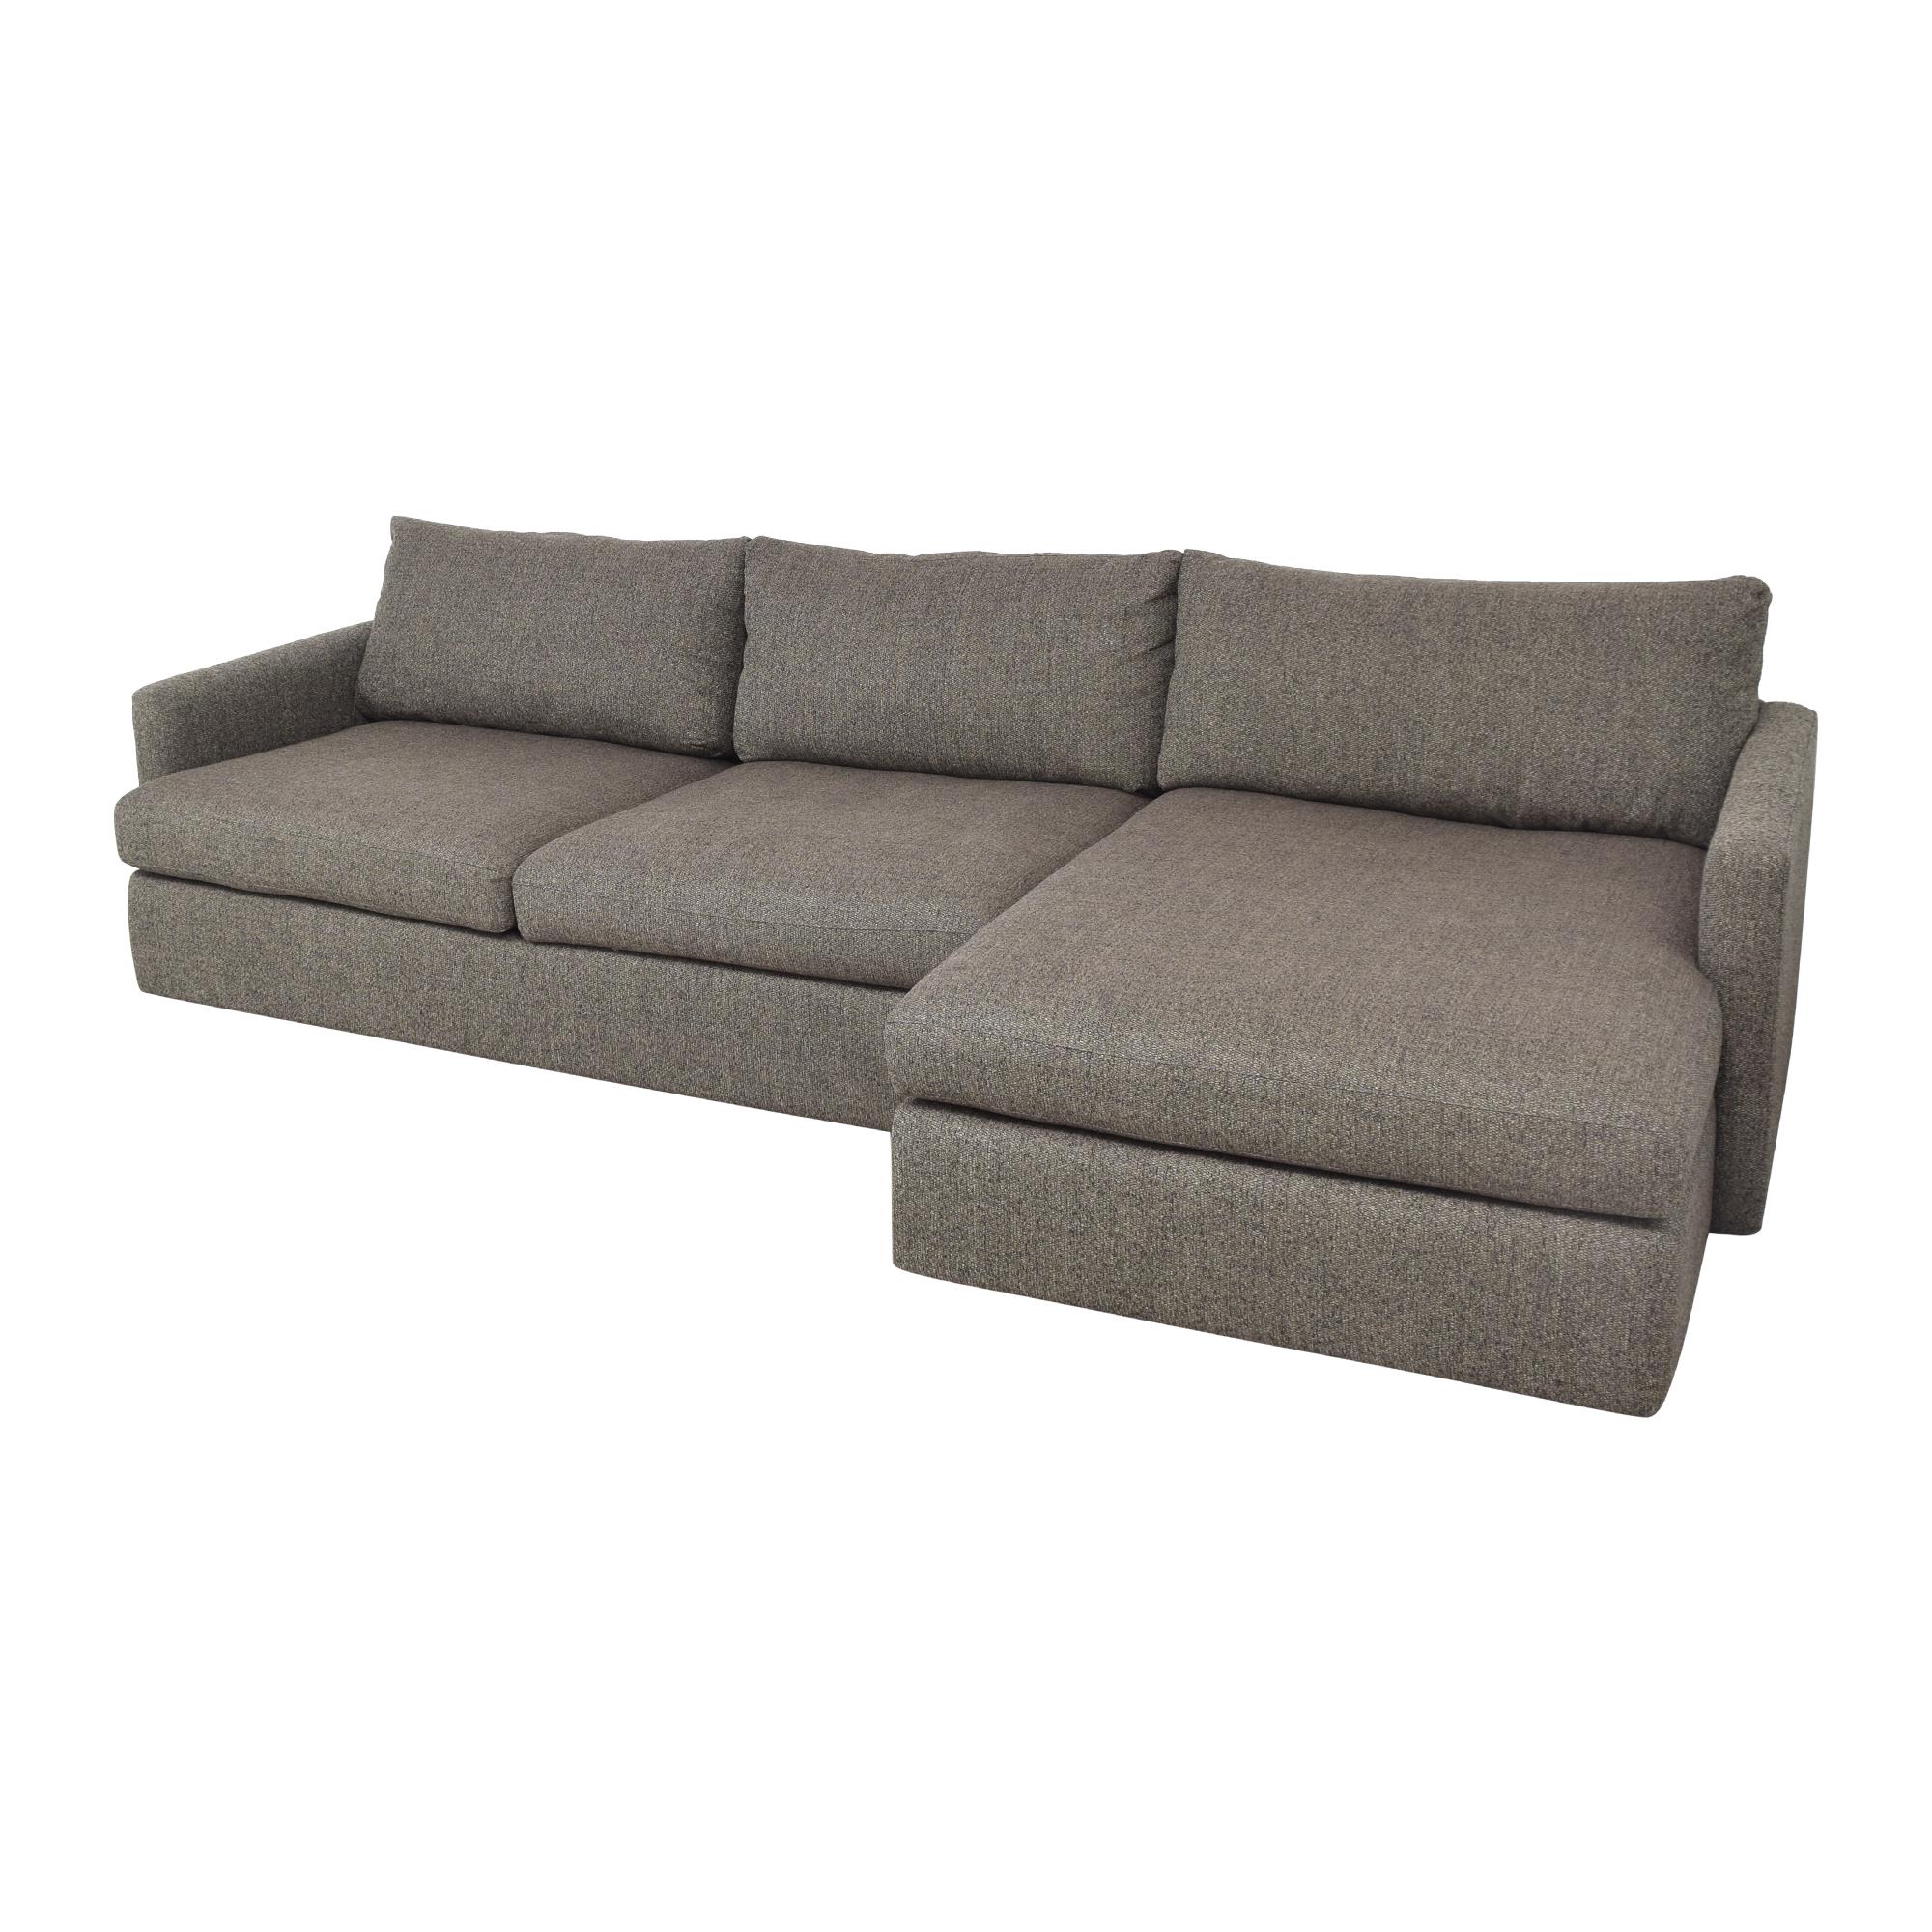 Crate & Barrel Crate & Barrel Lounge II 2-Piece Sectional Sofa